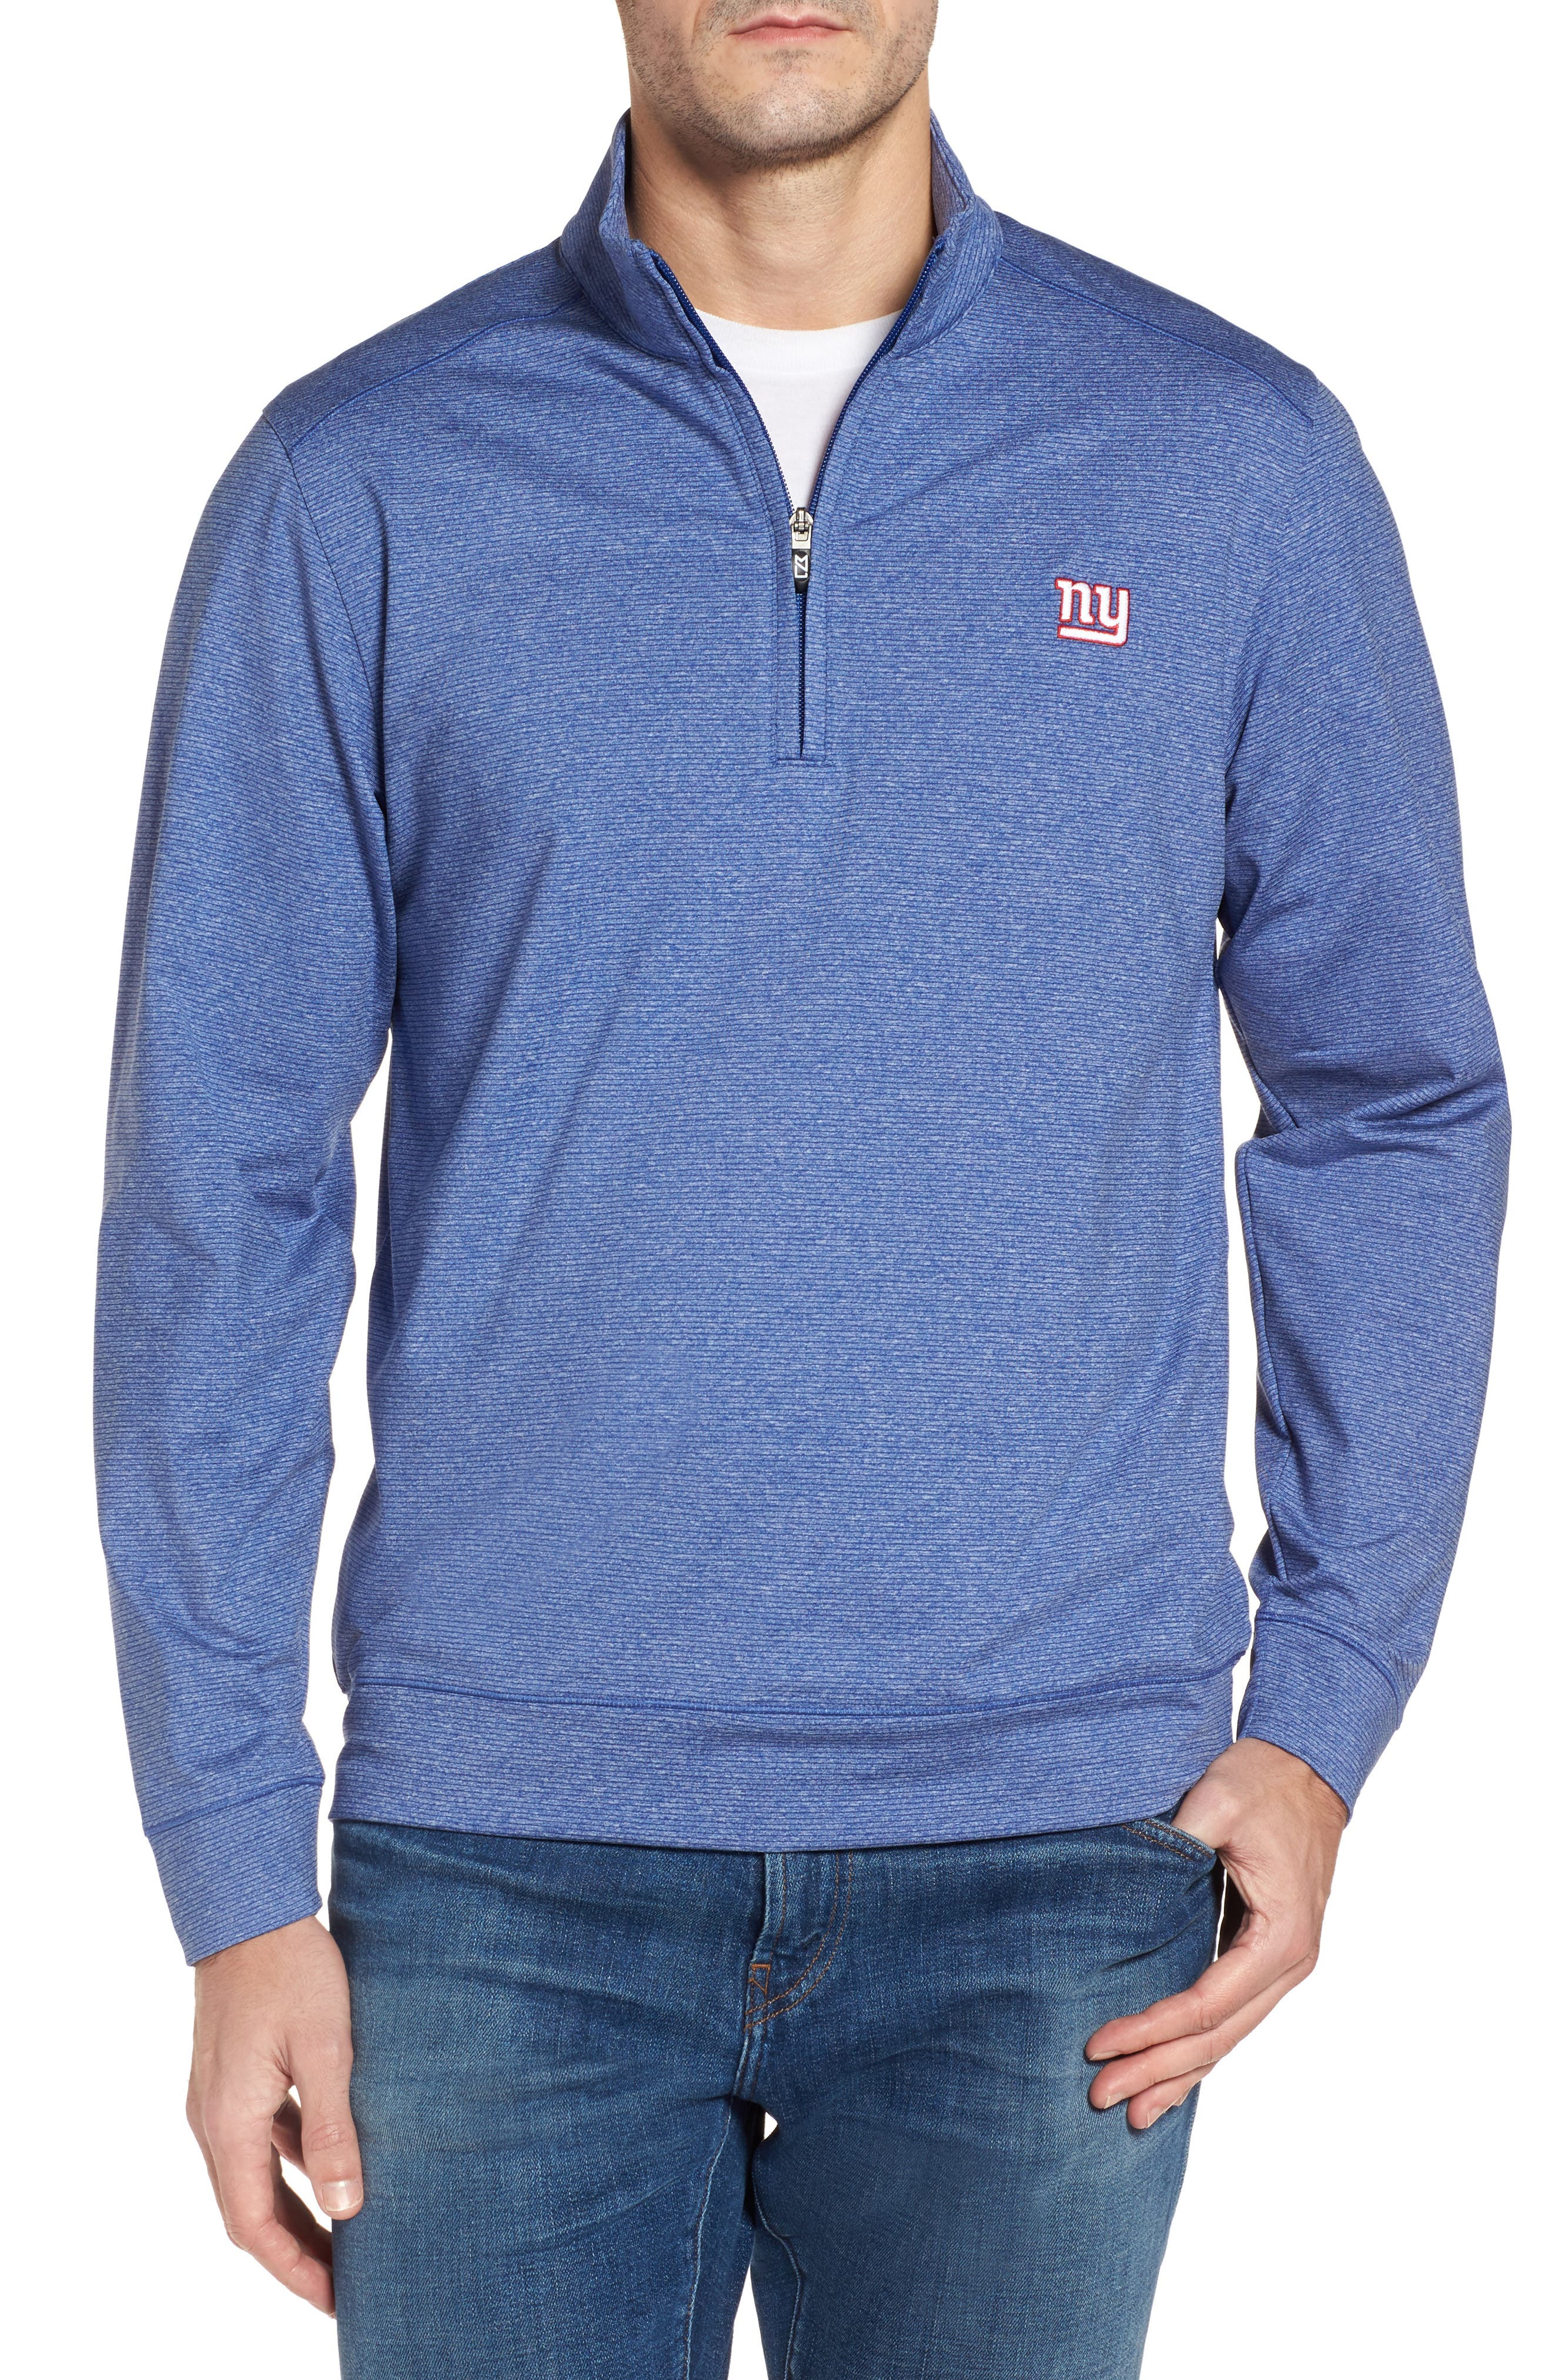 Shoreline - New York Giants Half Zip Pullover,                         Main,                         color, Tour Blue Heather